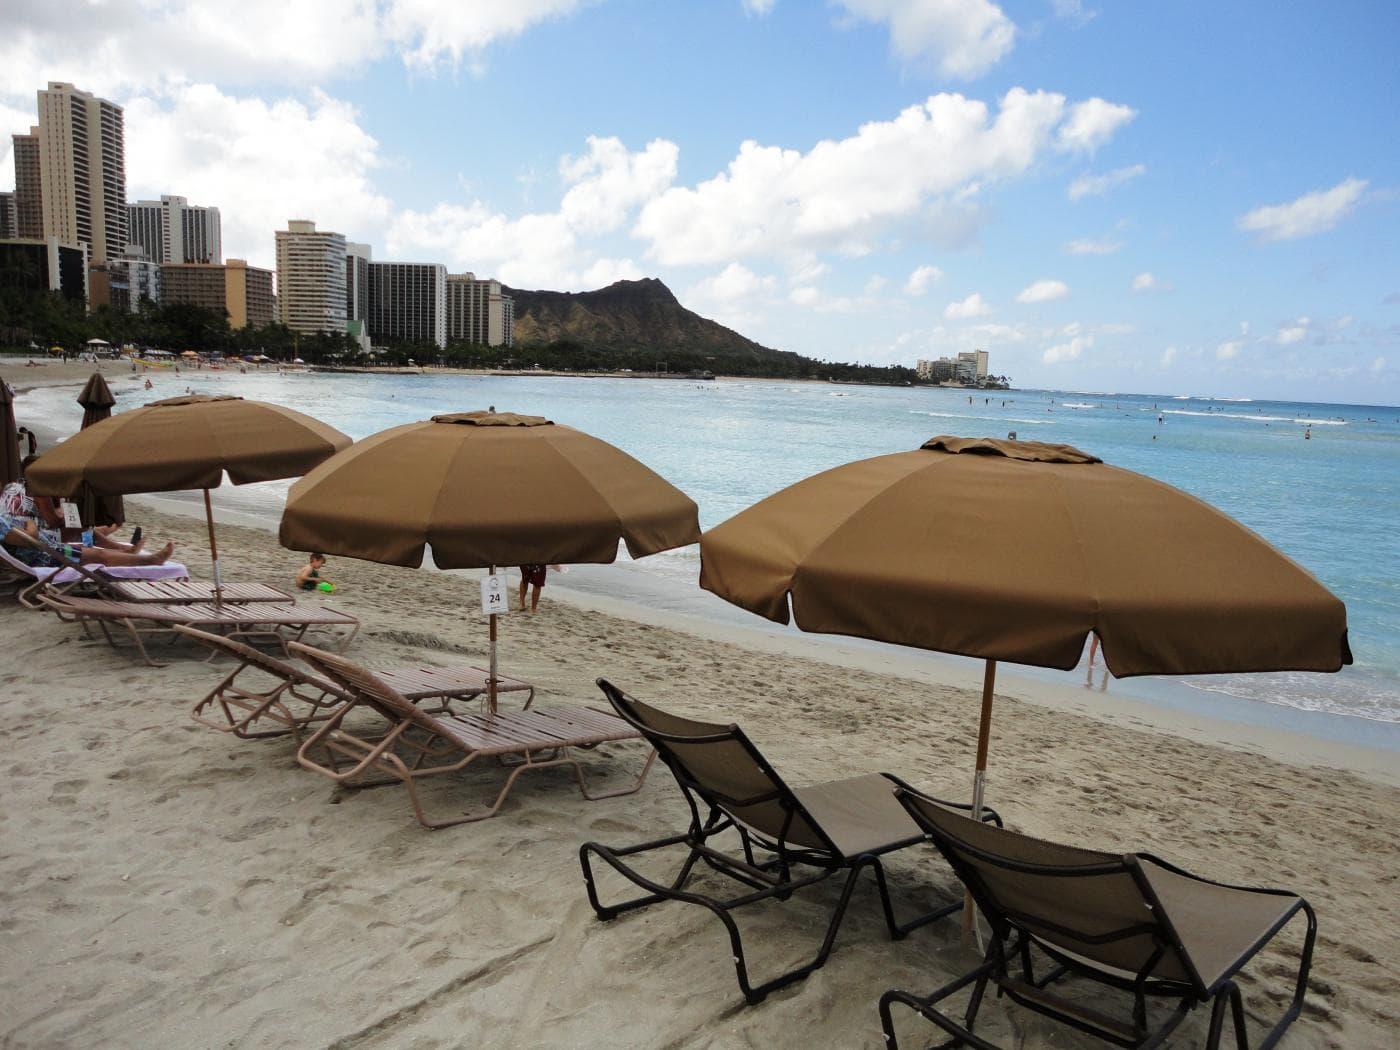 Shore Excursion Waikiki Beach Break   Honolulu Carnival Cruise Line 1400x1050